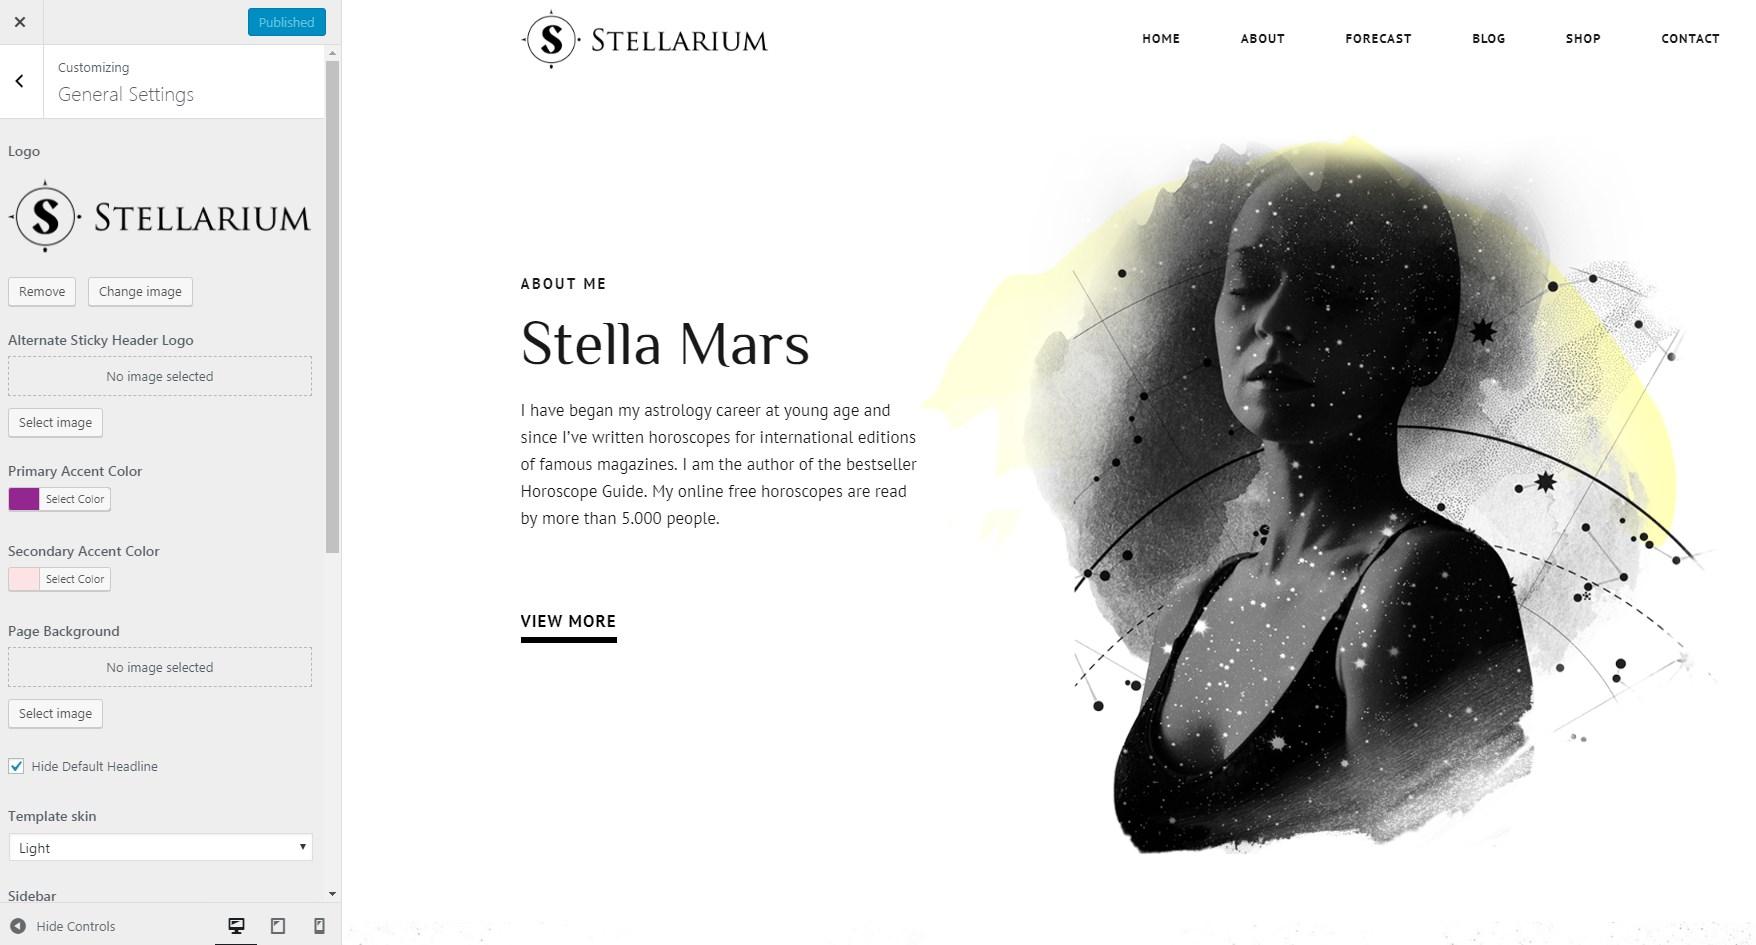 https://documentation.bold-themes.com/stellarium/wp-content/uploads/sites/34/2018/06/stellarium-customize-02.jpg